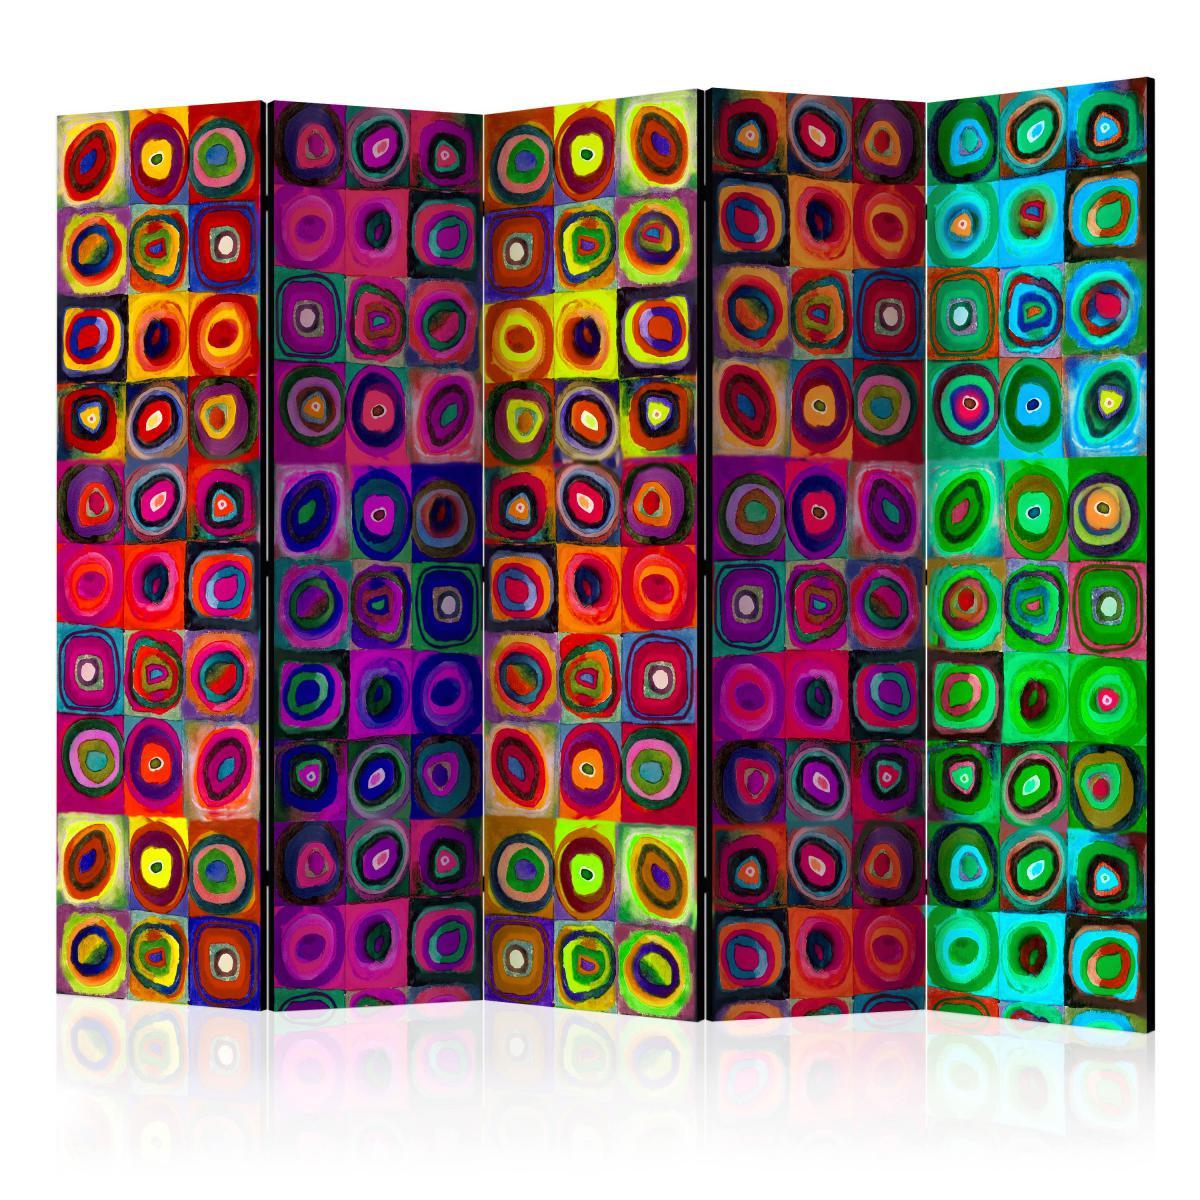 Bimago Paravent 5 volets - Colorful Abstract Art II [Room Dividers] - Décoration, image, art | 225x172 cm | XL - Grand Format |